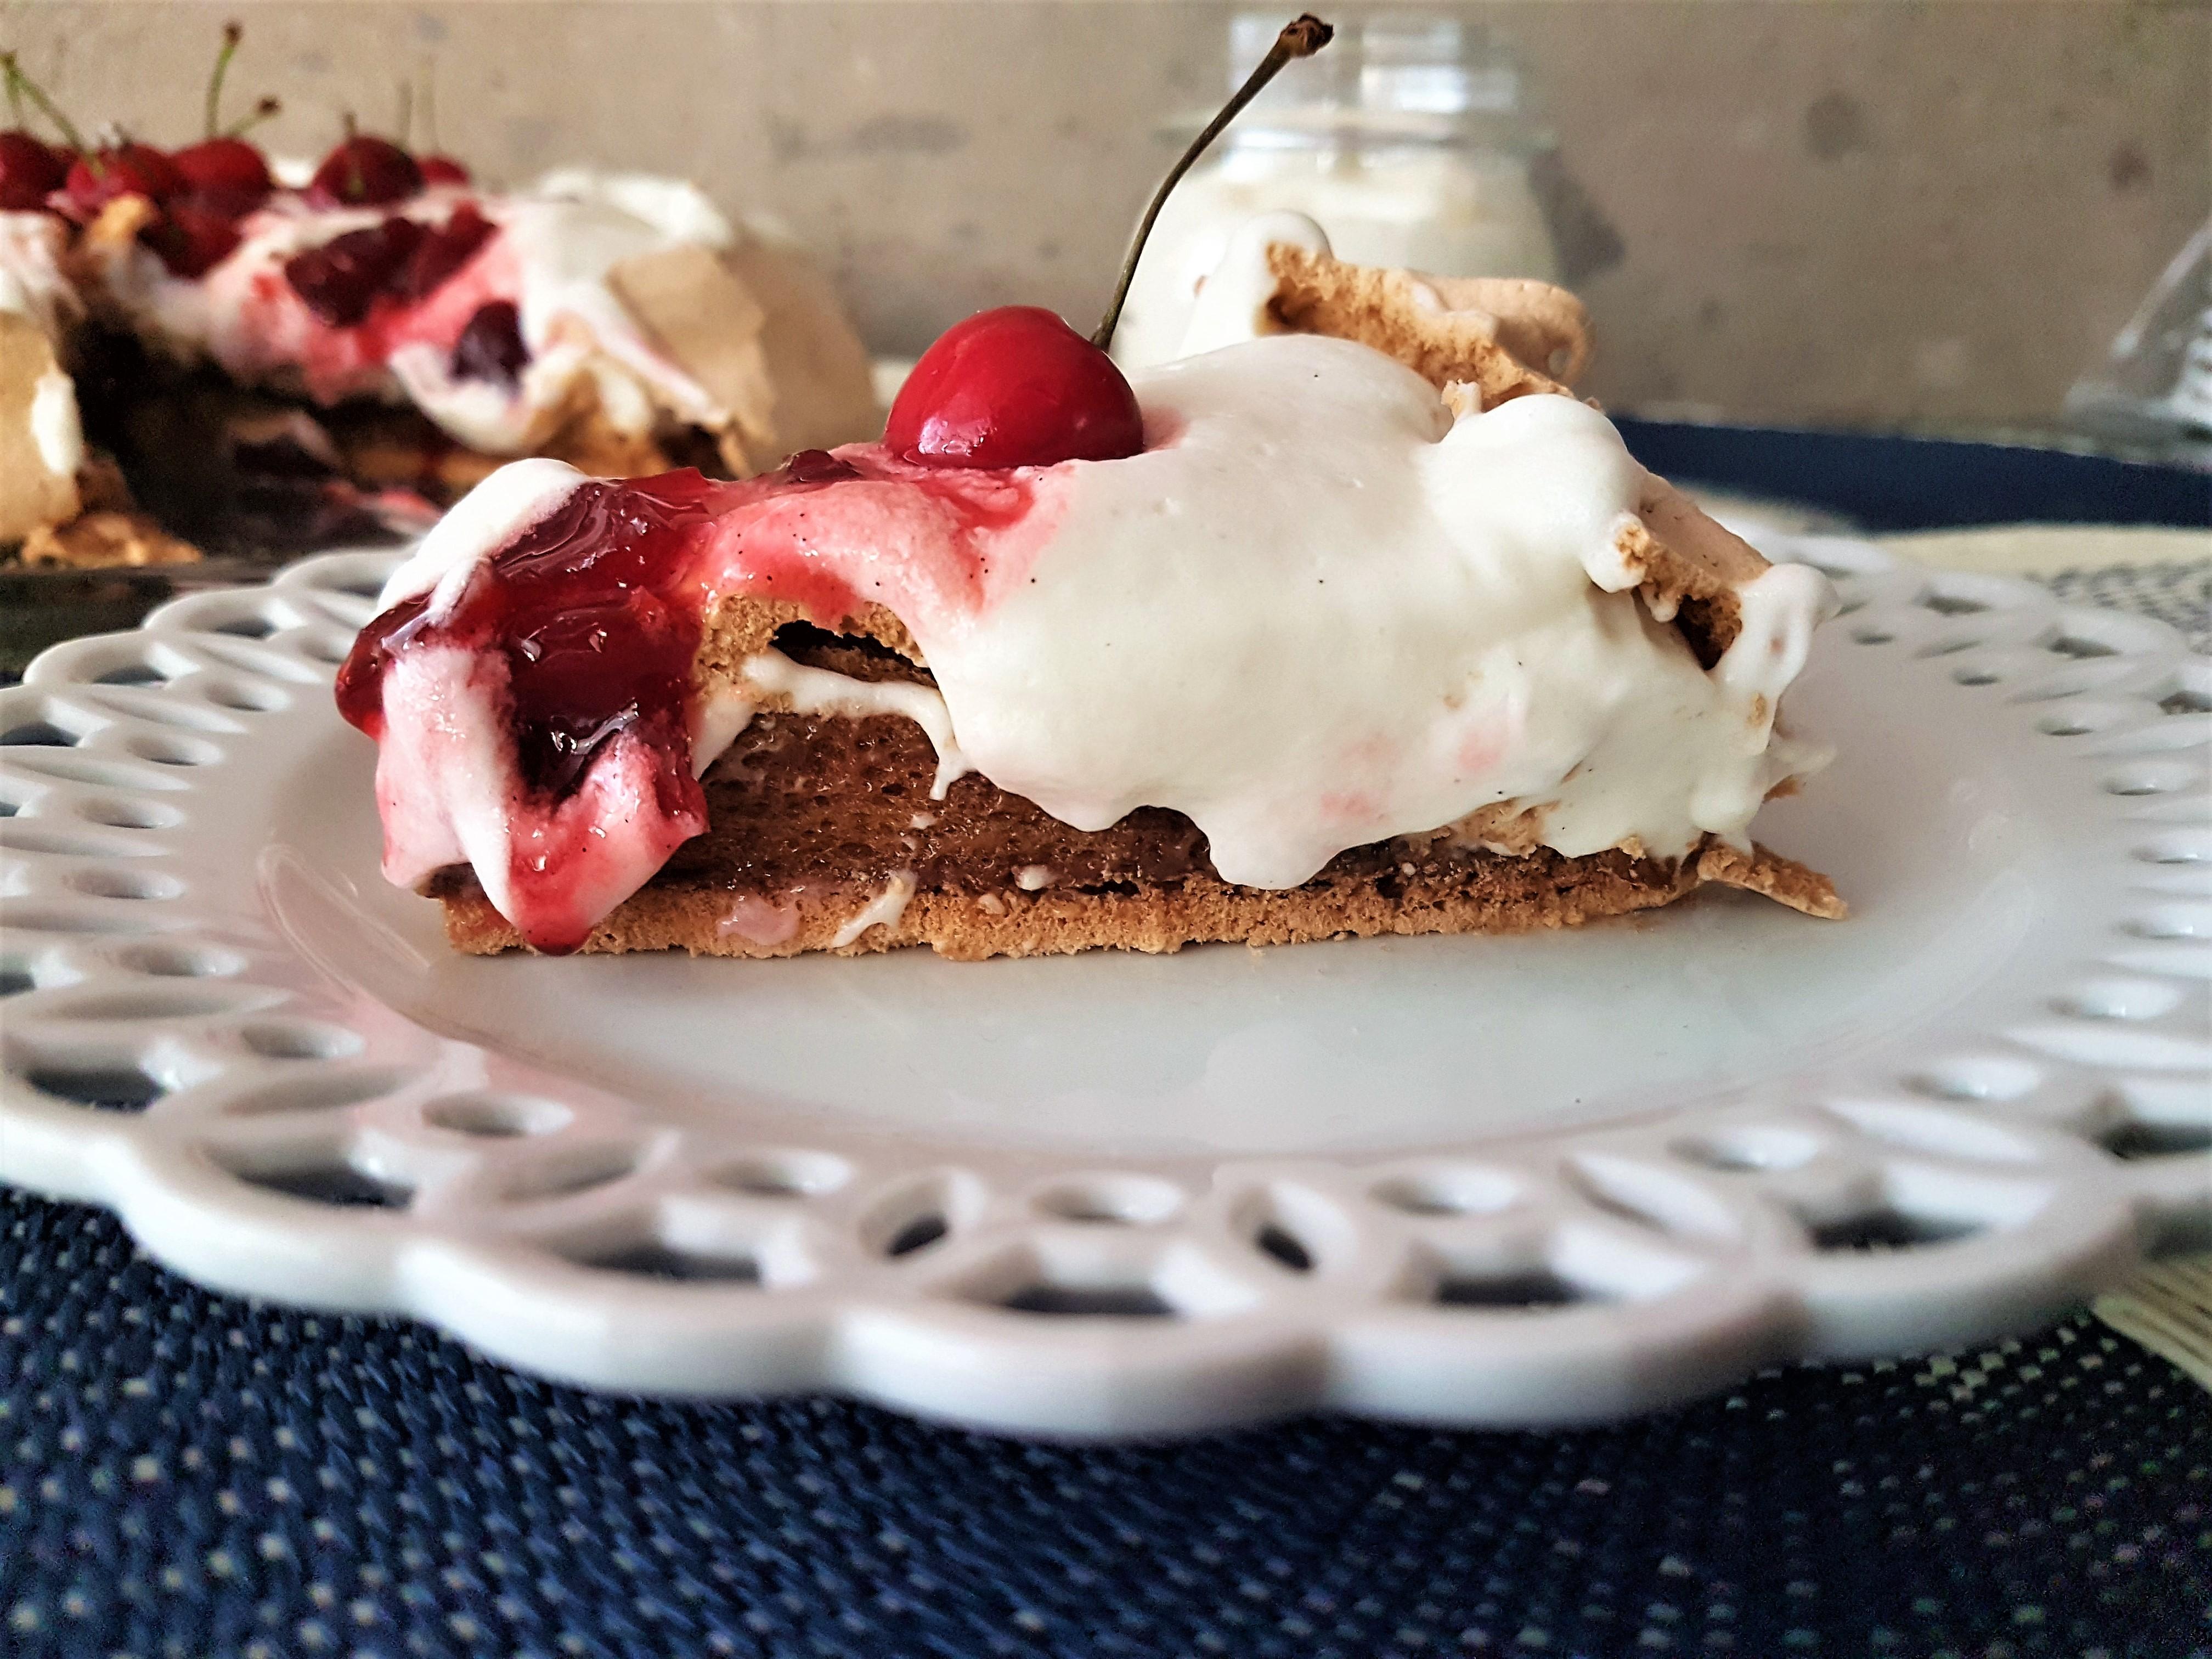 Pavlova de café con crema de mascarpone y compota de cerezas